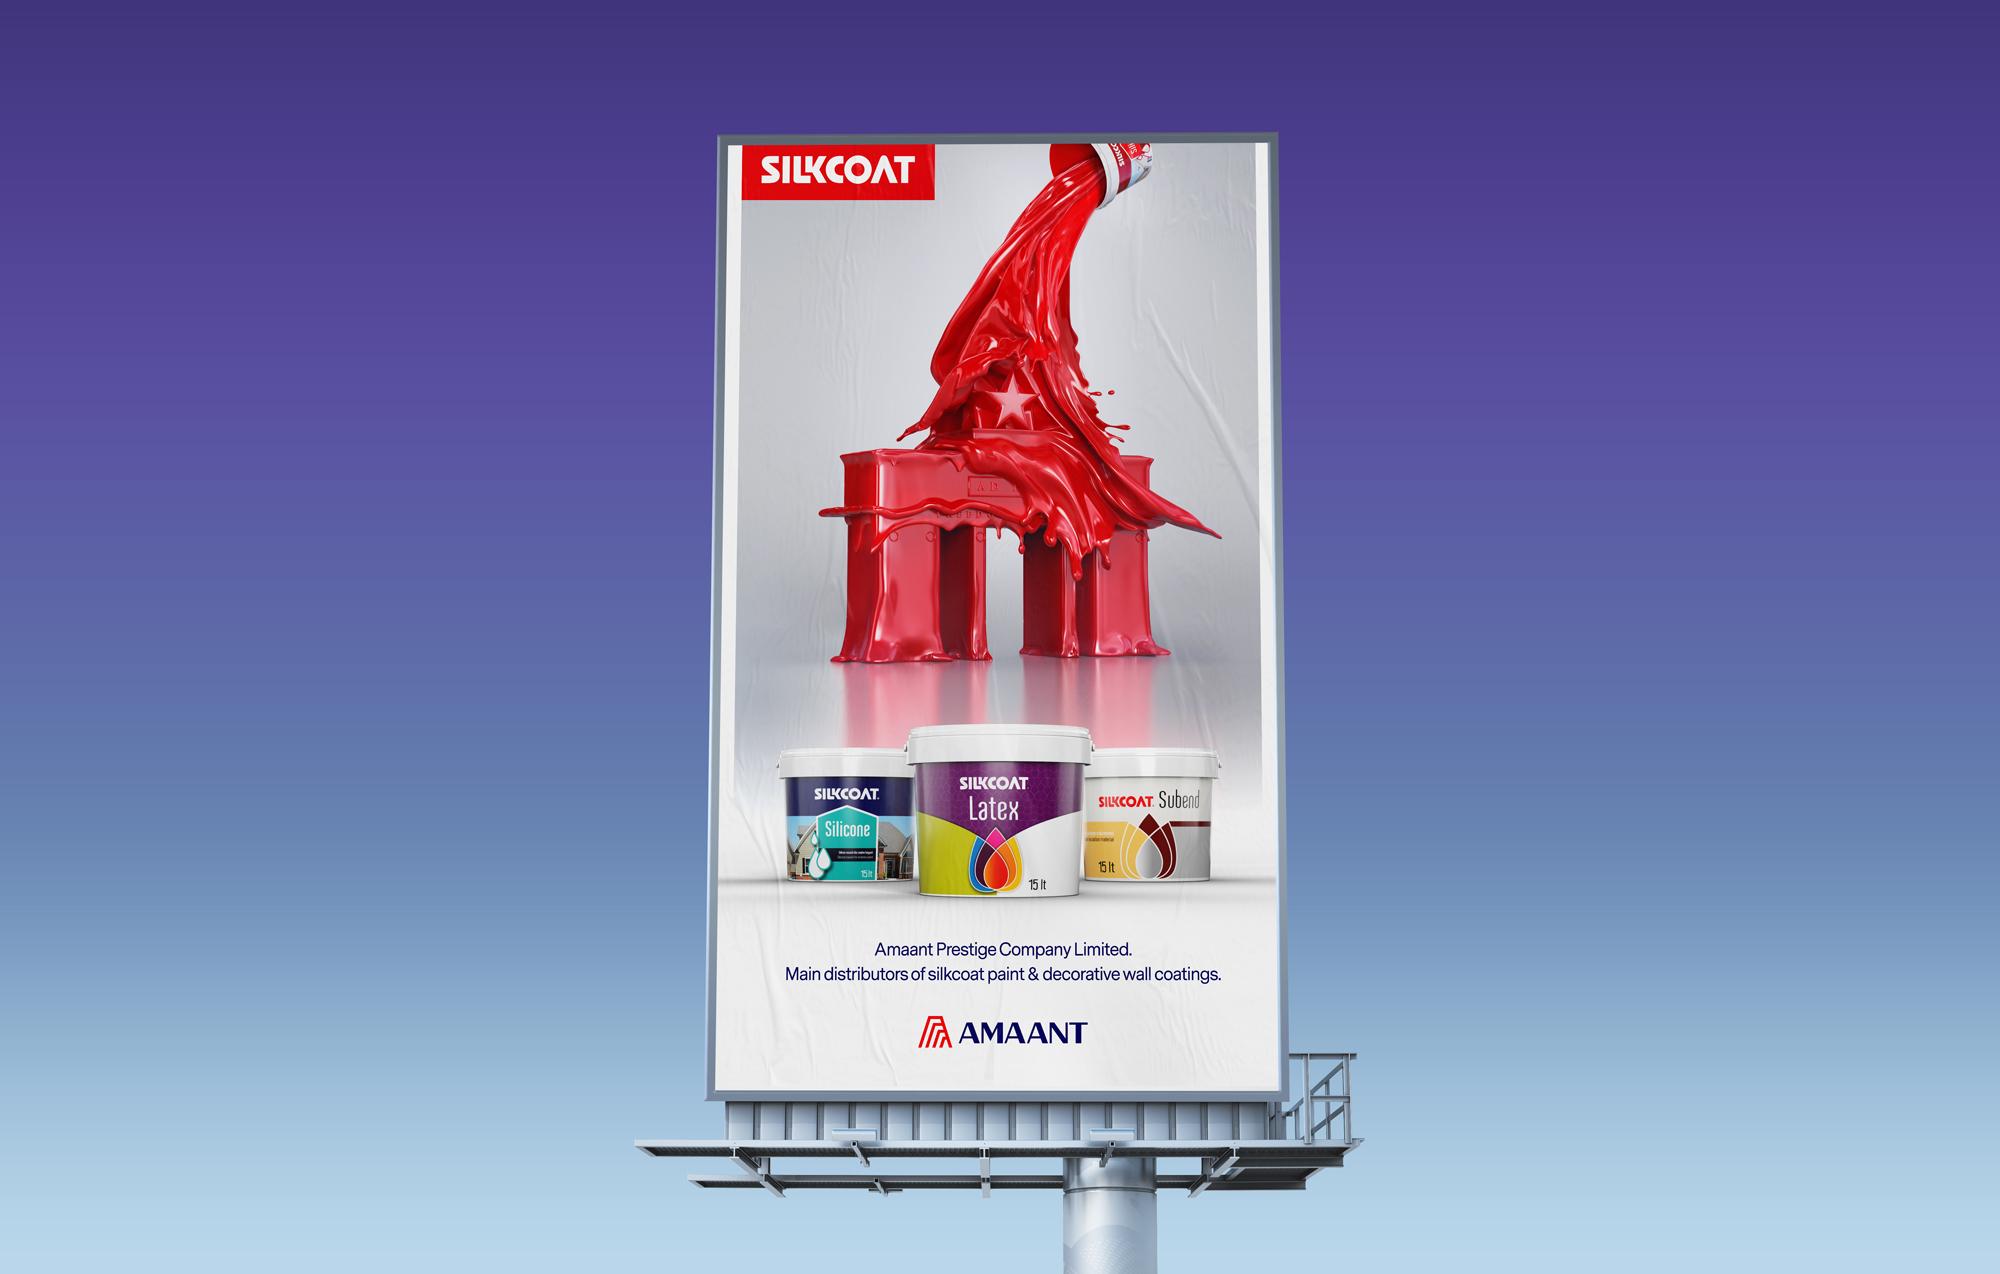 silkcoat_billboard_2